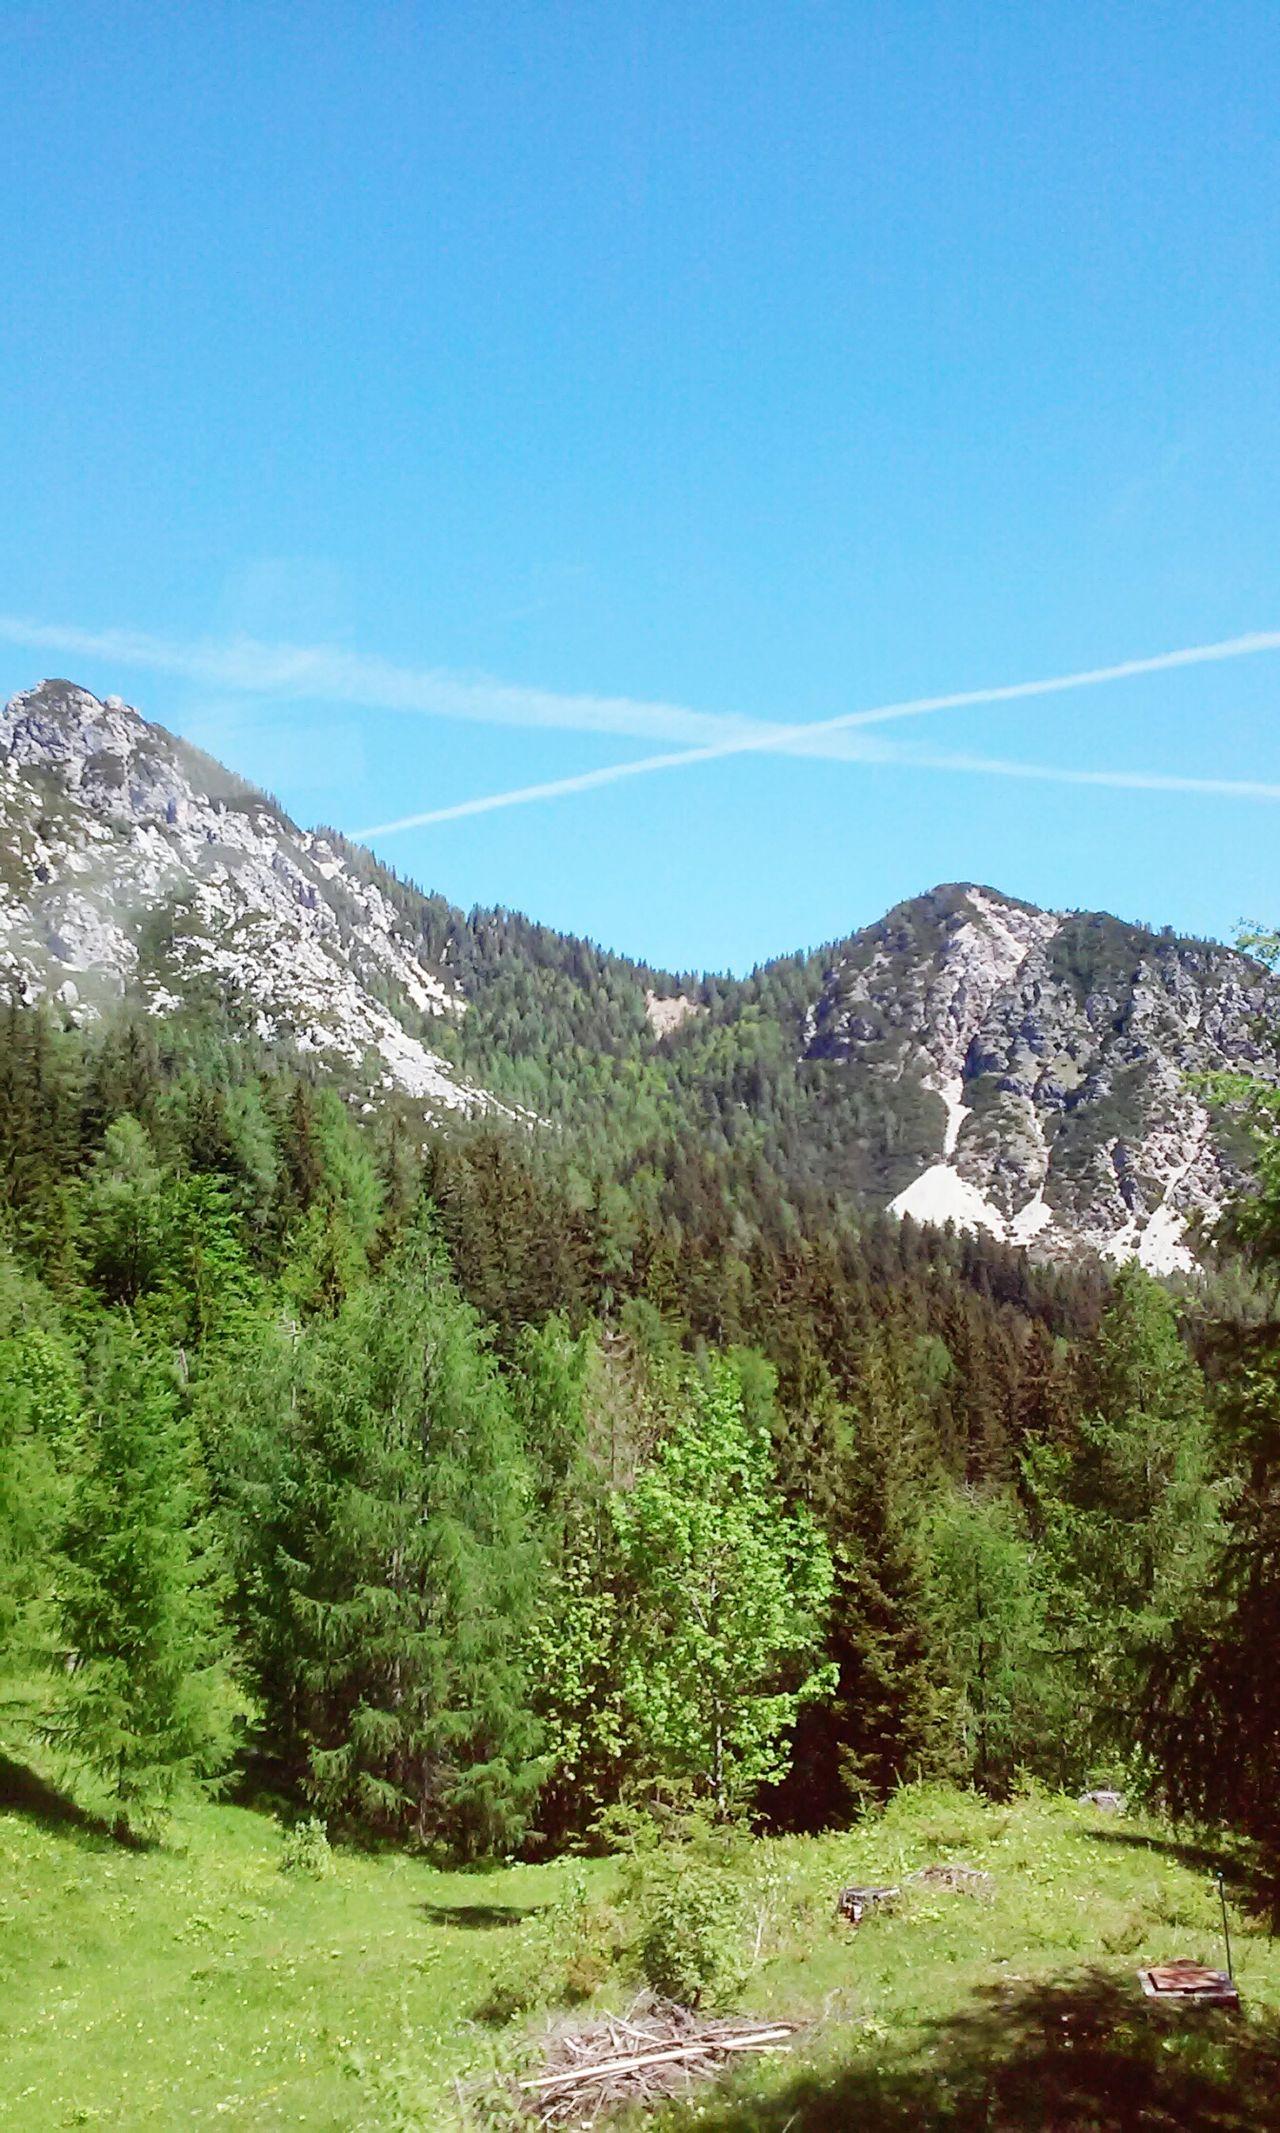 Mountains Mountain View Amazing Trees Beautiful Green Pinetrees Slovenia Vrsic Sky